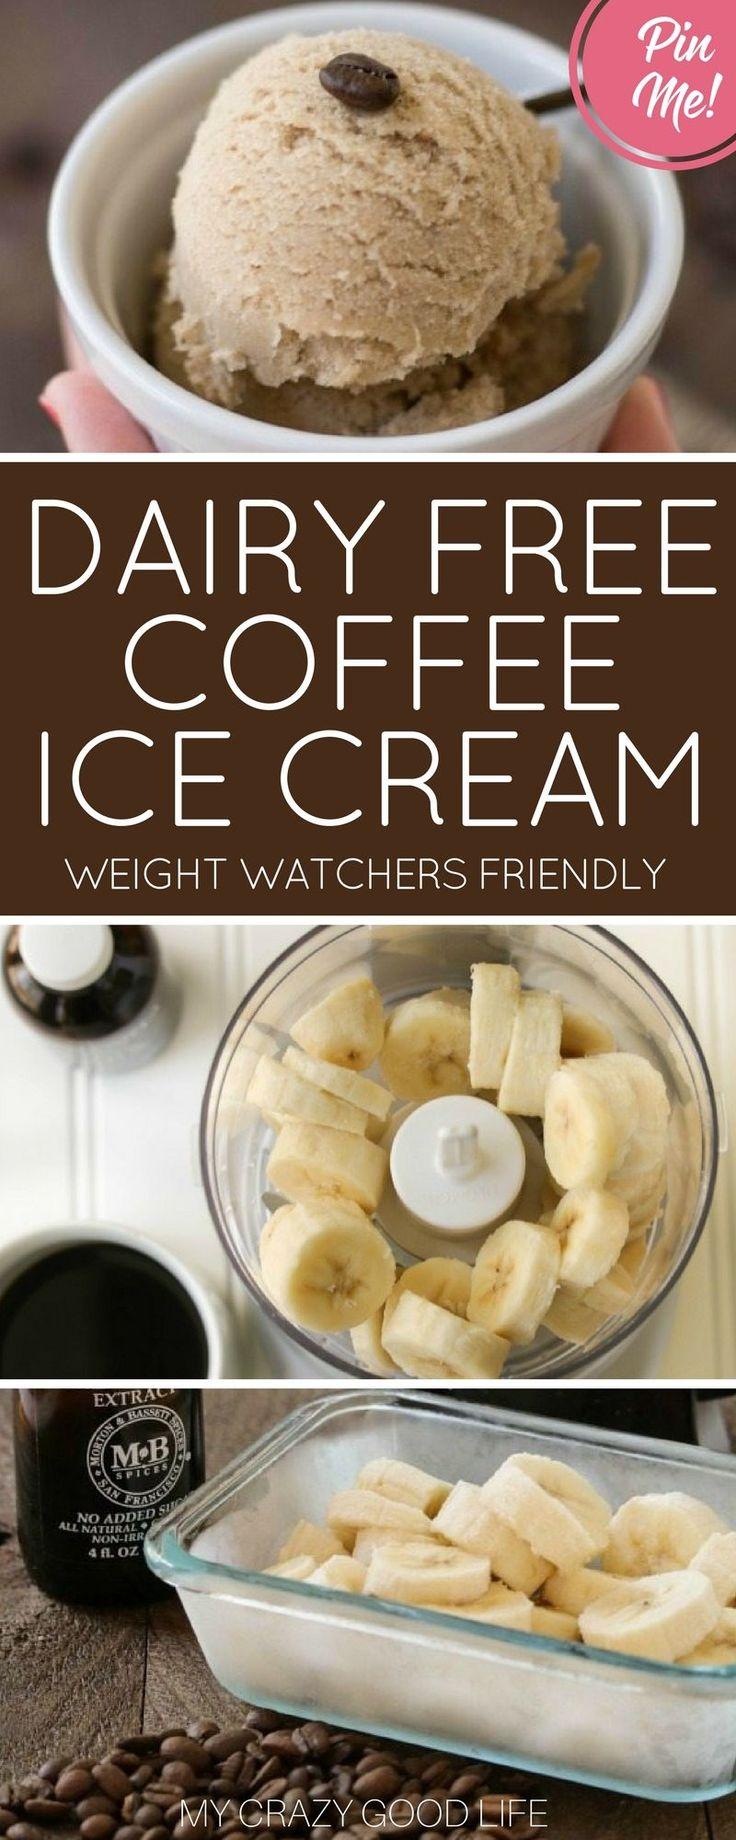 Dairy Free Coffee Ice Cream Recipe   Gluten Free   My Crazy Good Life